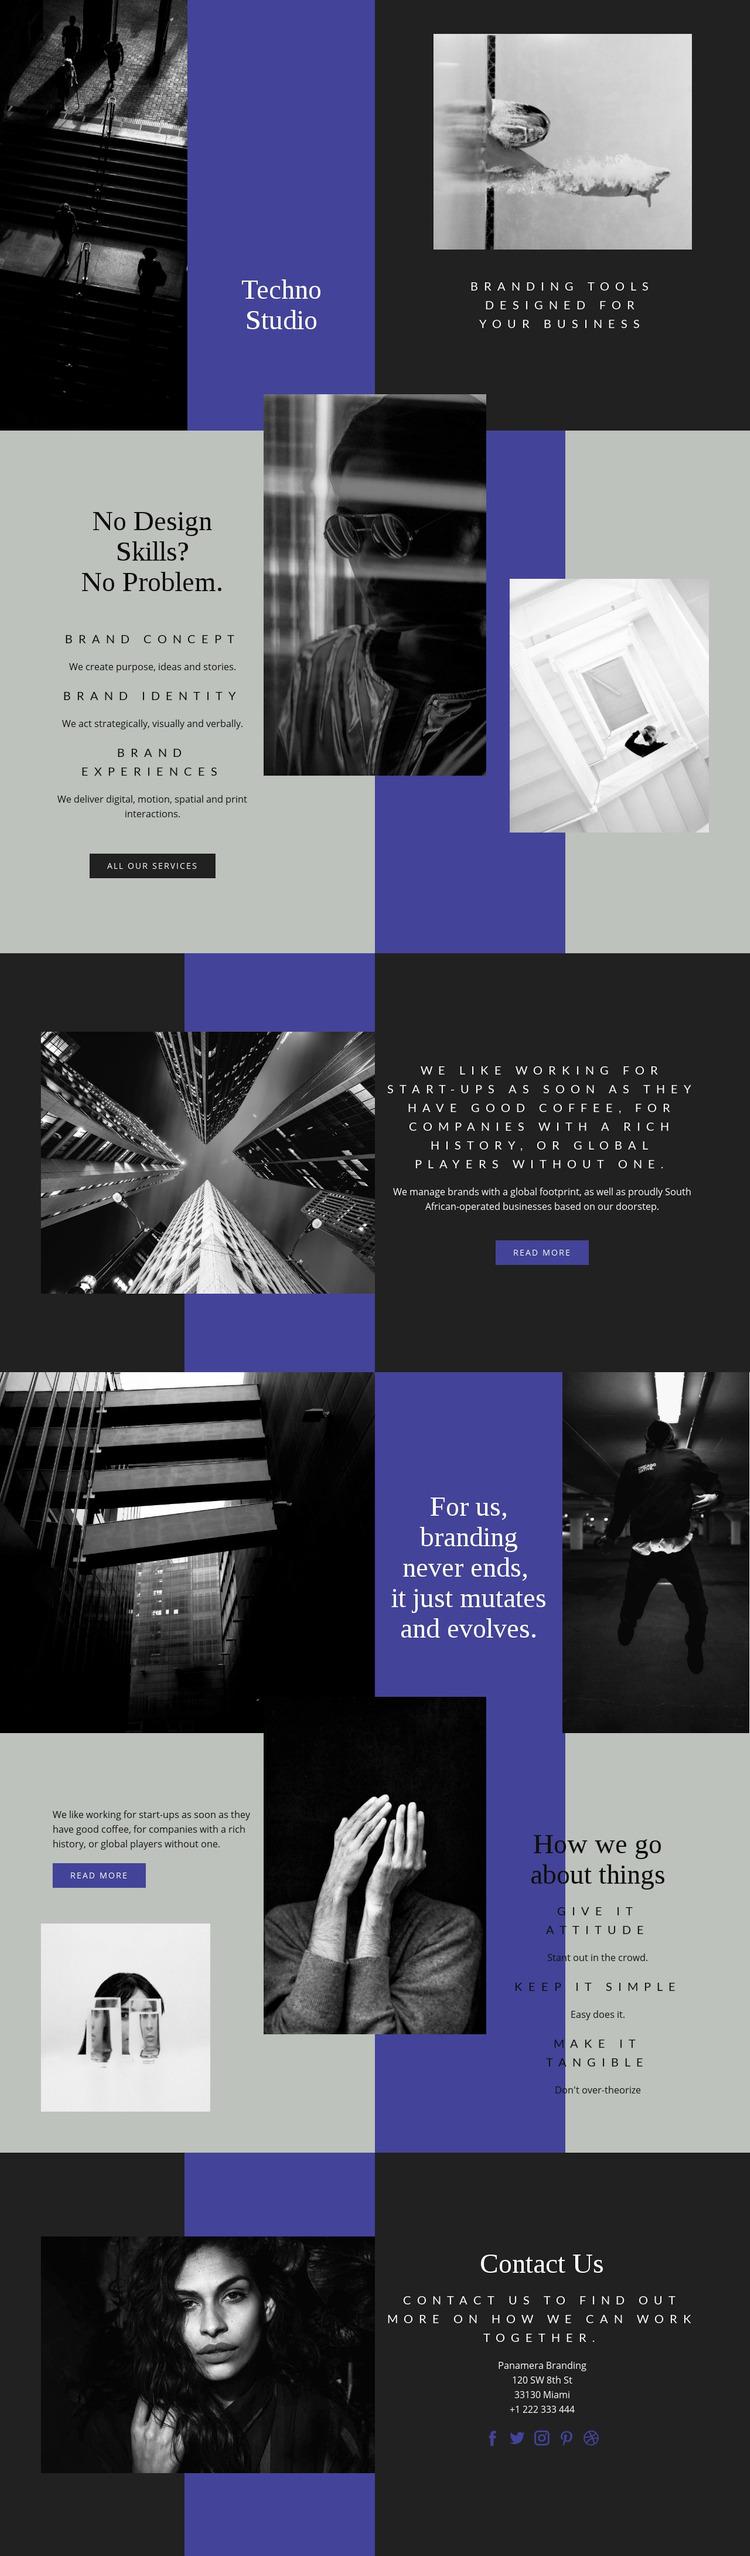 Techno skills in business Website Maker